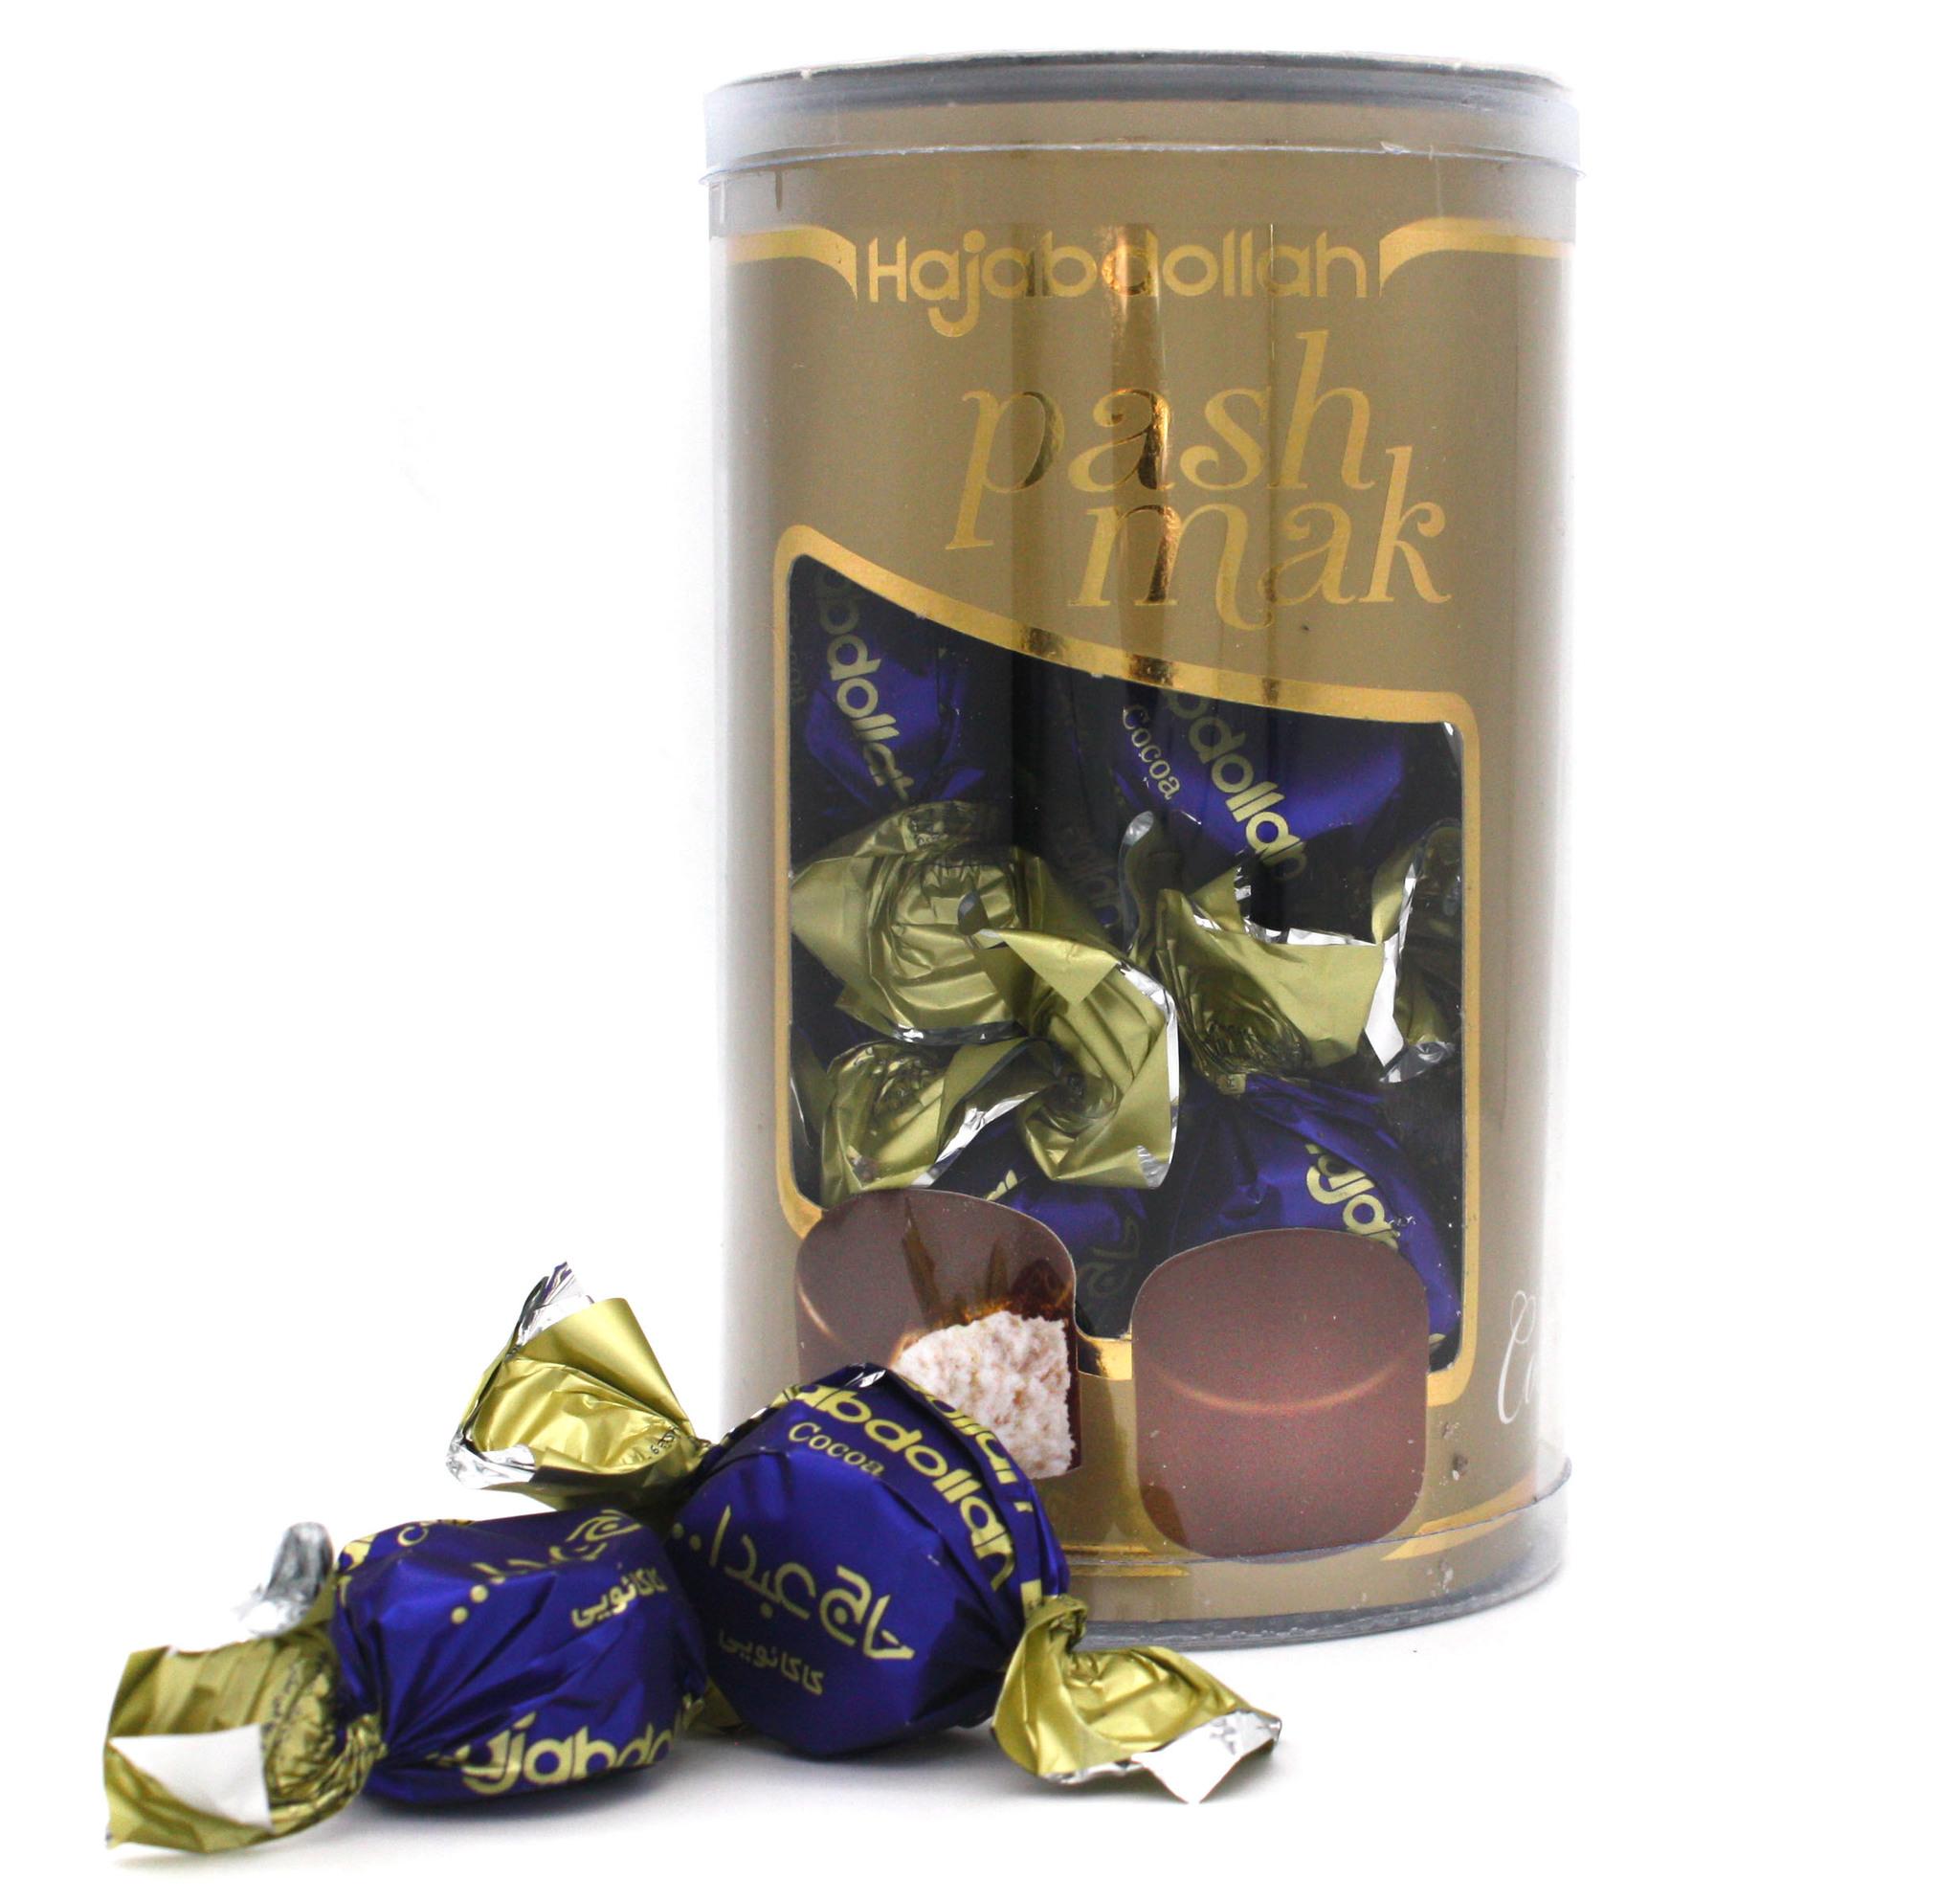 Пишмание Пишмание со вкусом ванили в шоколадной глазури, Hajabdollah, 200 г import_files_45_450876f32aaa11e9a9a6484d7ecee297_8928833430f111e9a9a6484d7ecee297.jpg